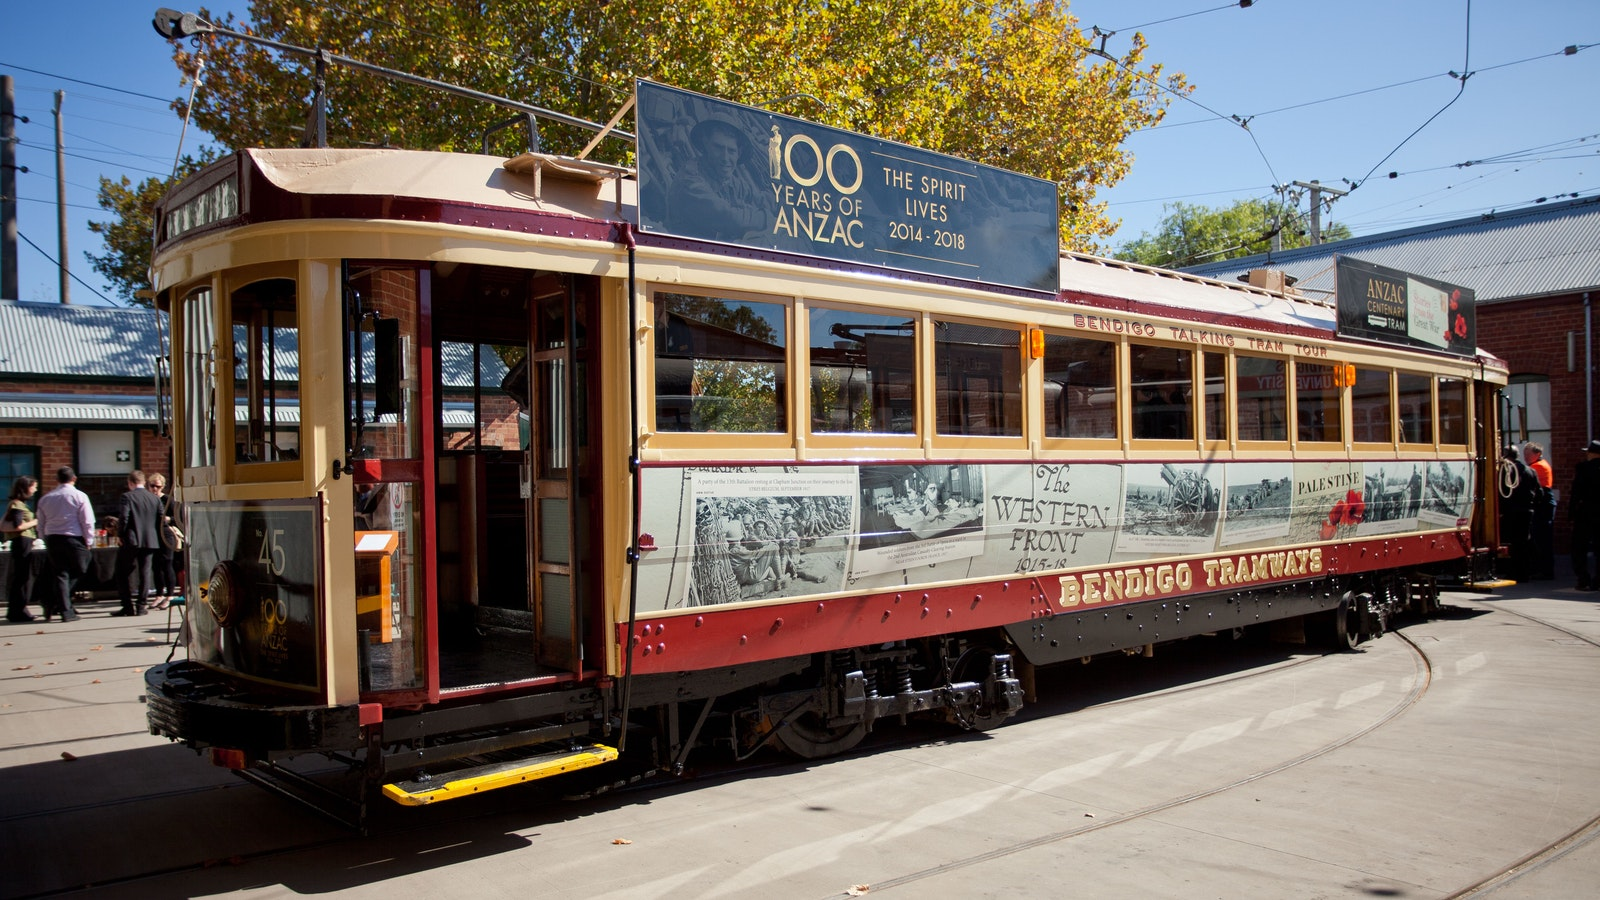 Anzac Centenary Tram